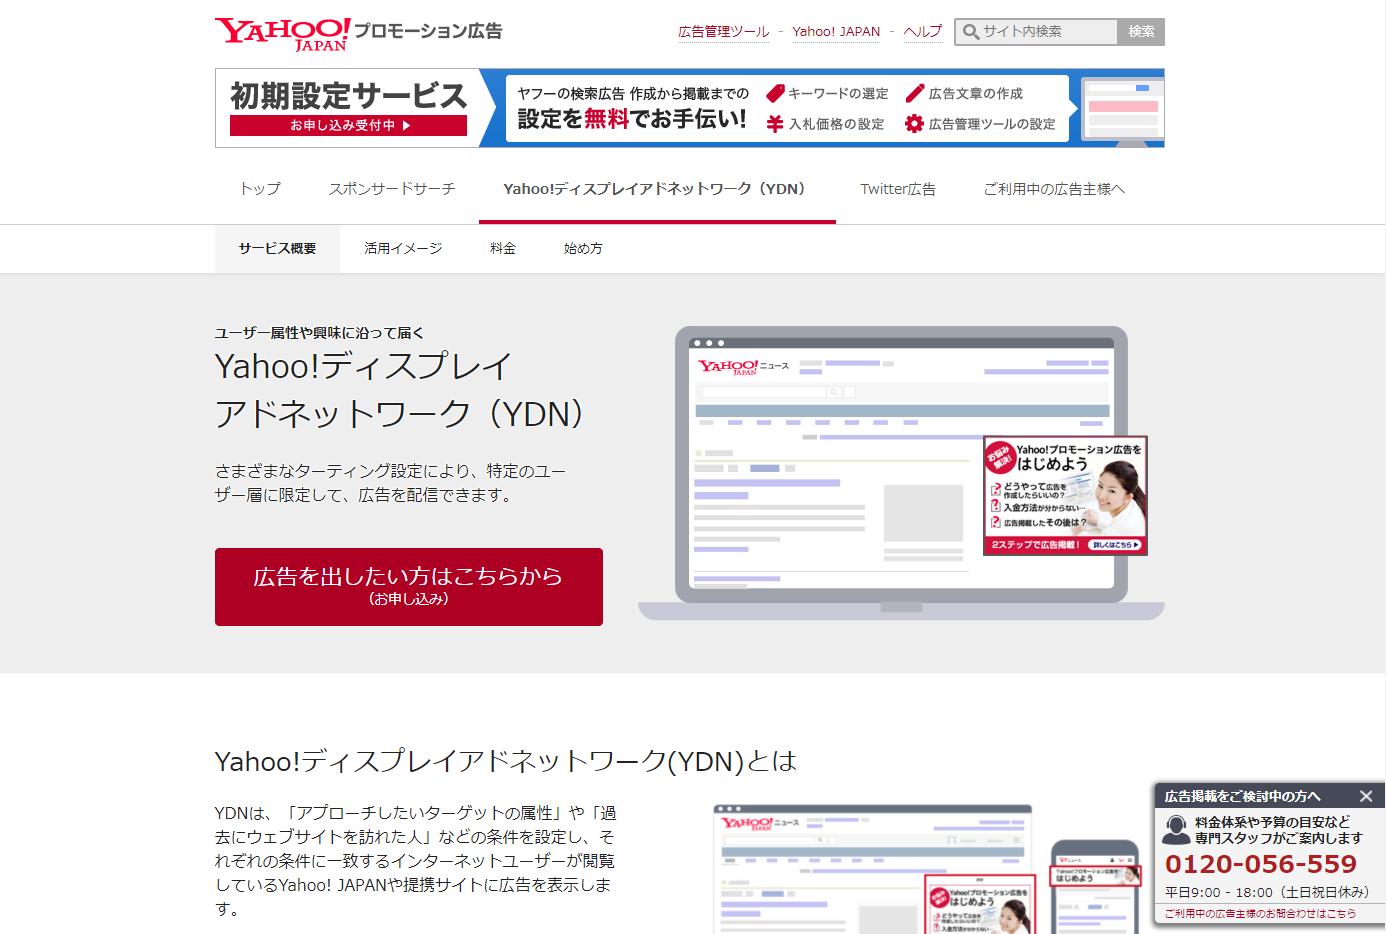 Yahoo! Display Network